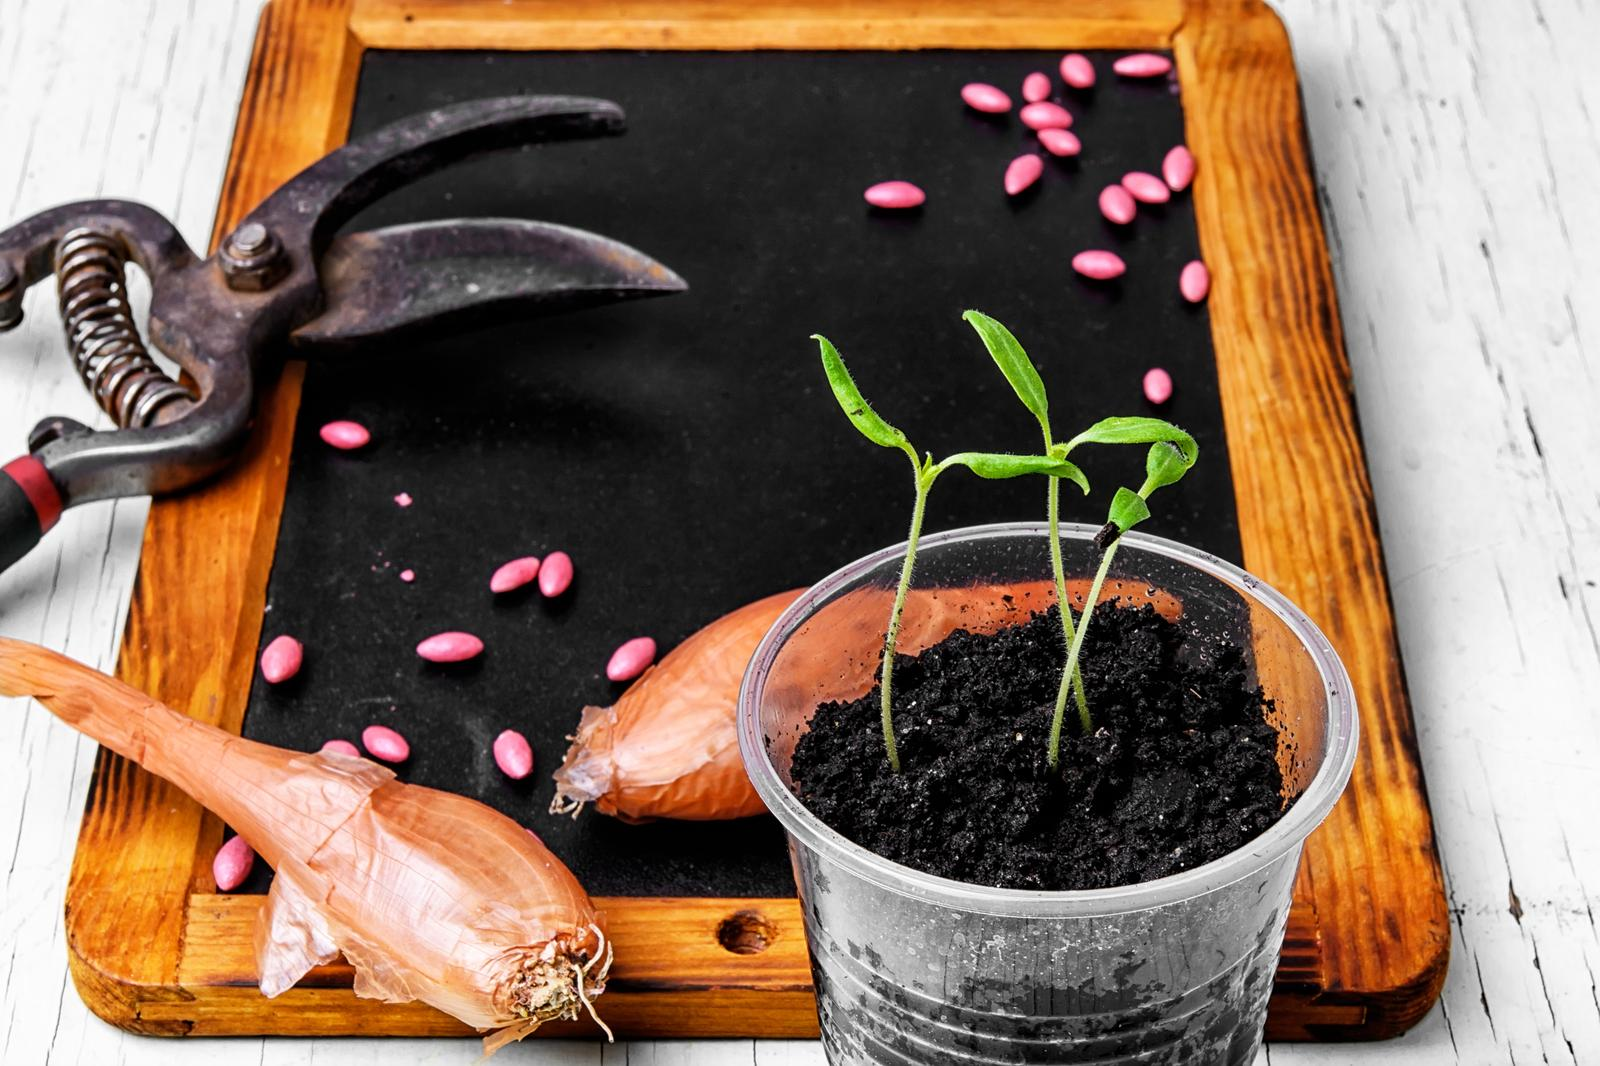 Retail sale of flowers, plants, seeds, transplants and fertilizers in Jõgeva